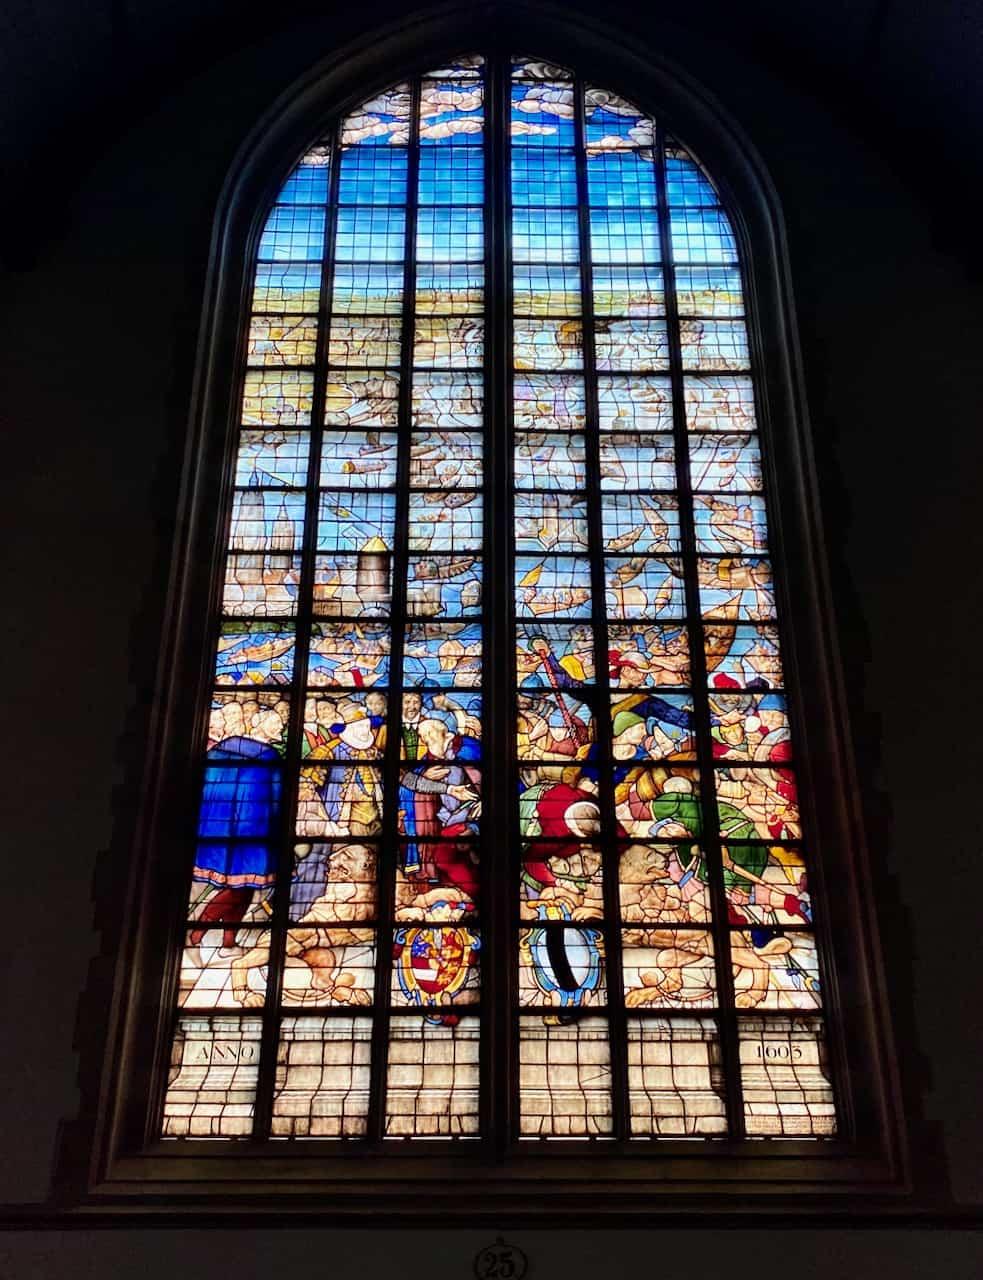 sint-jan-gouda-stained-glass-window-photo